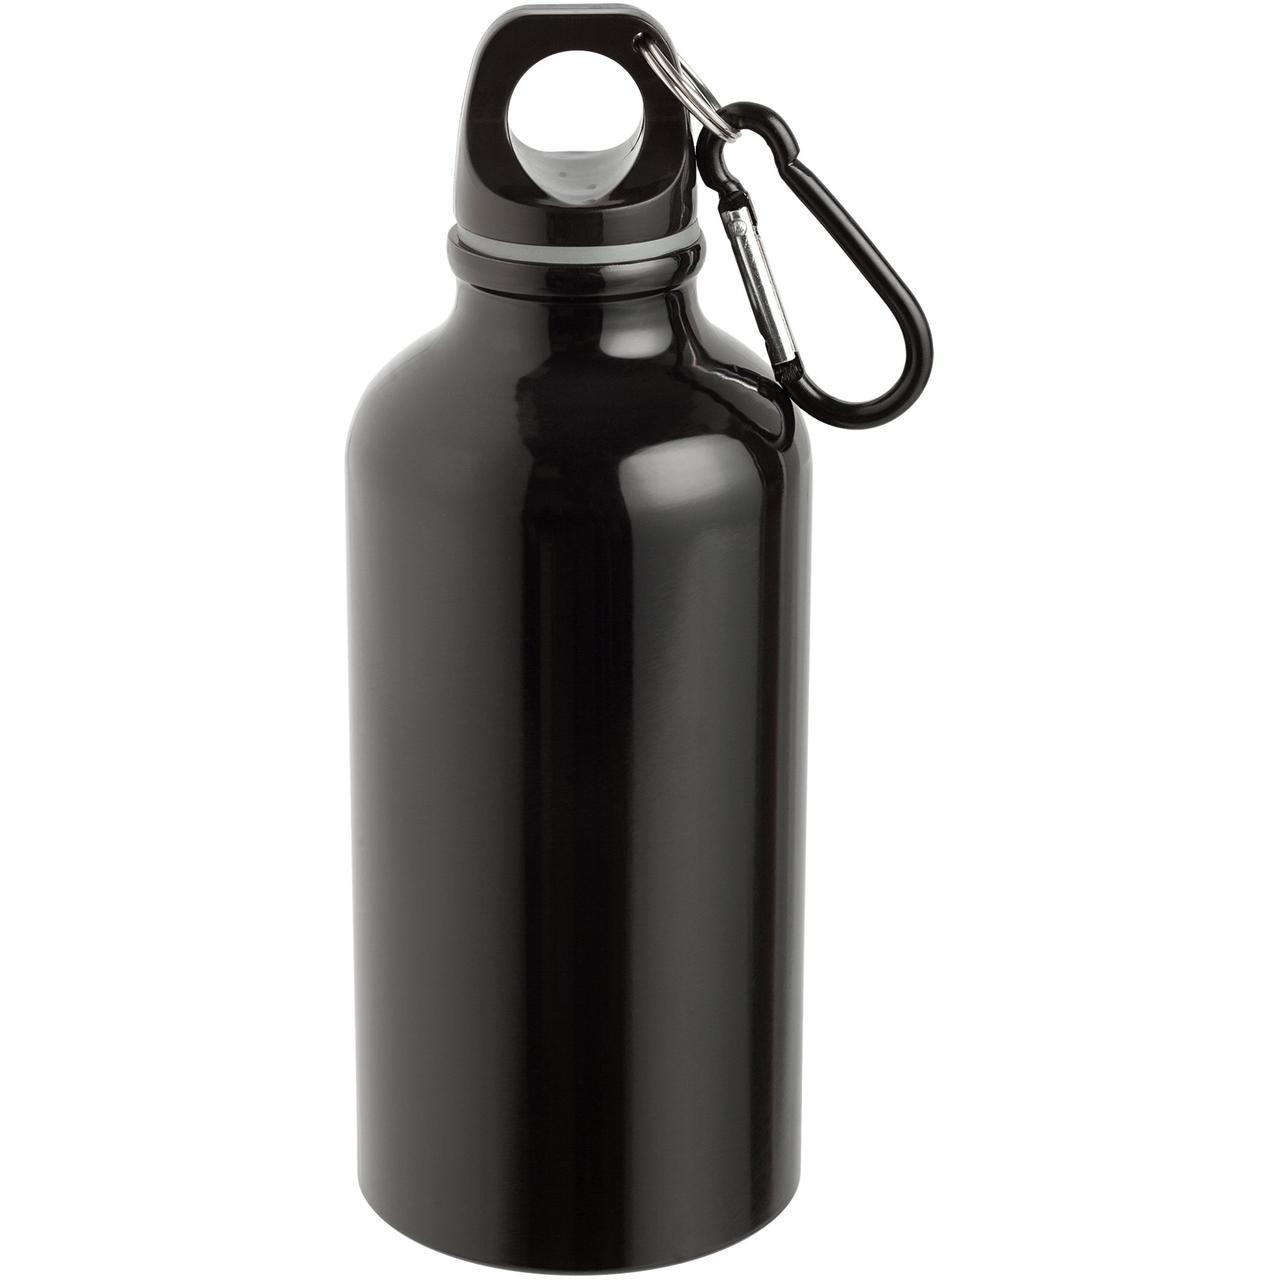 Бутылка для спорта Re-Source, черная (артикул 7504.30)